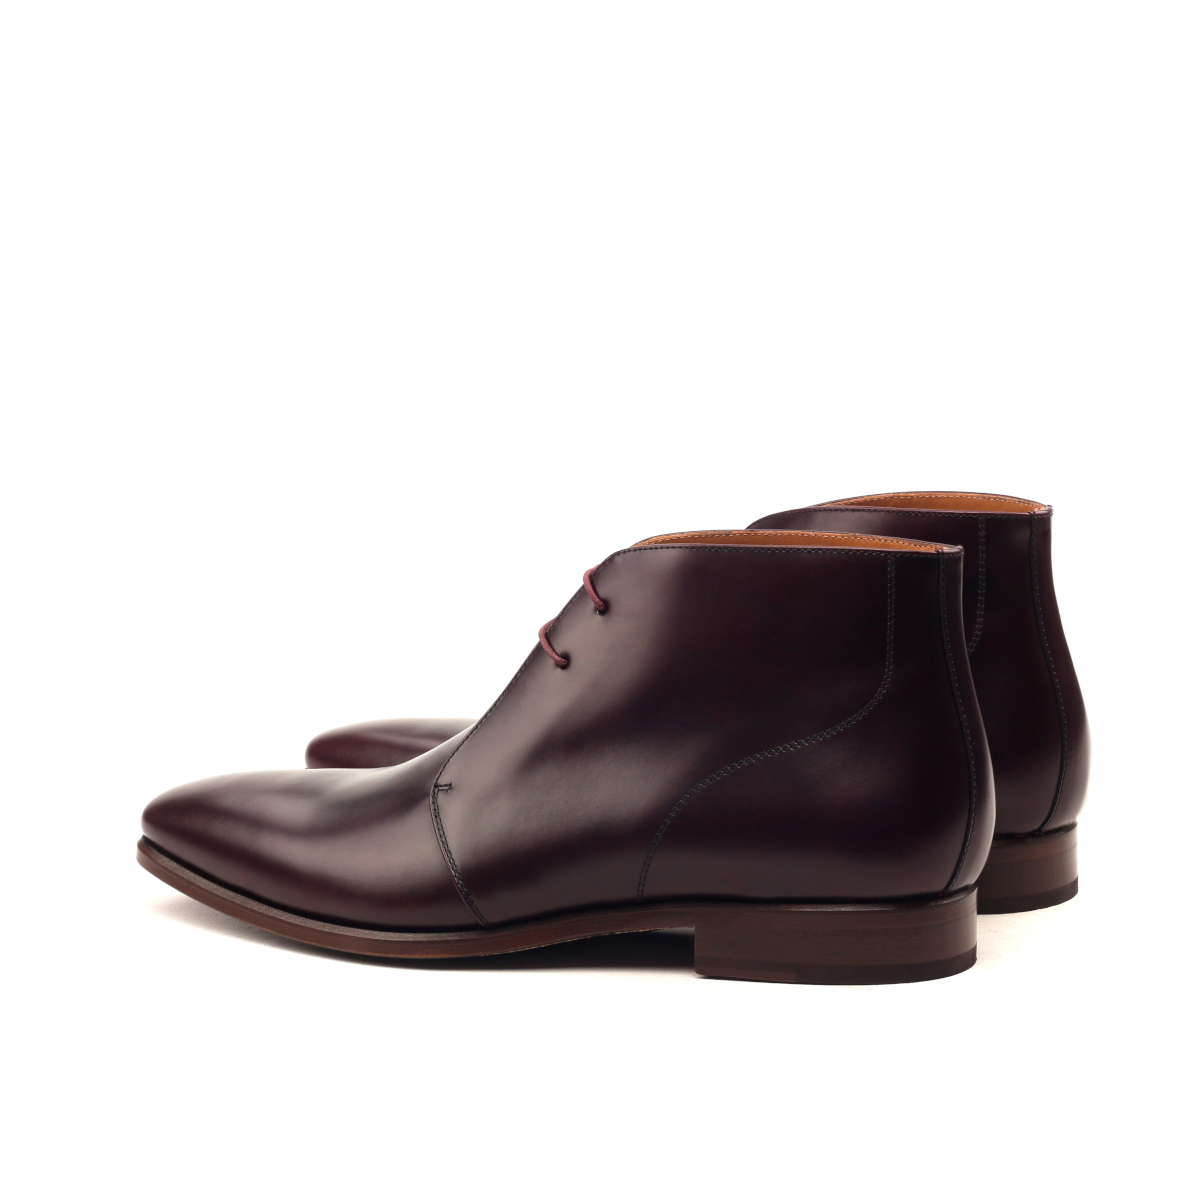 Burgundy box calf Chukka boot